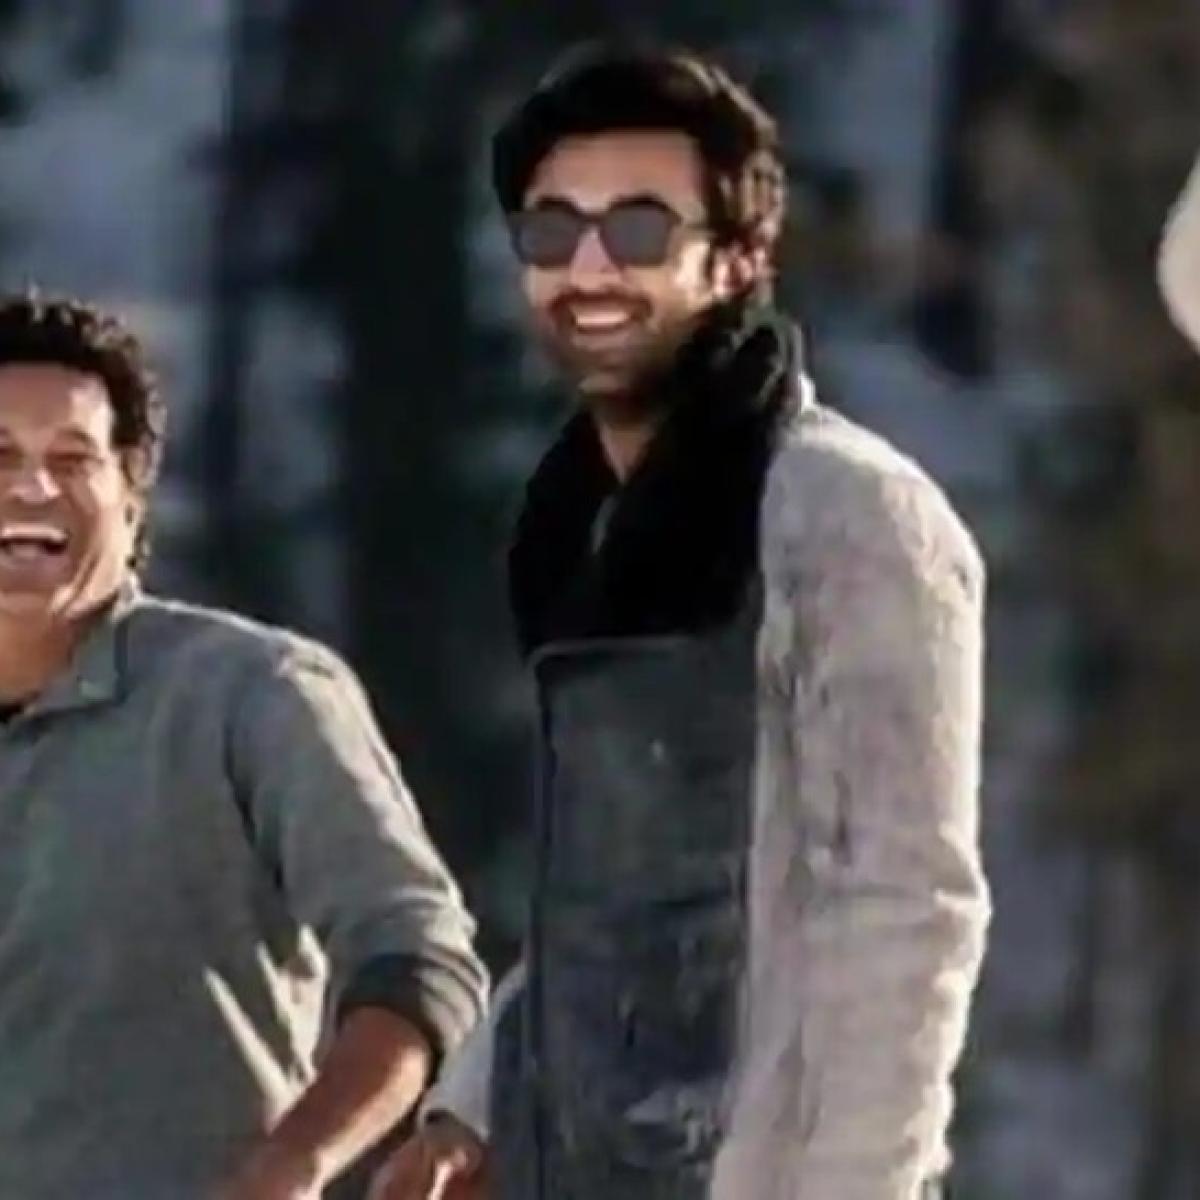 Neetu Kapoor wants Ranbir, Sachin Tendulkar to 'knock all sickness, viruses out of this planet' with their bats